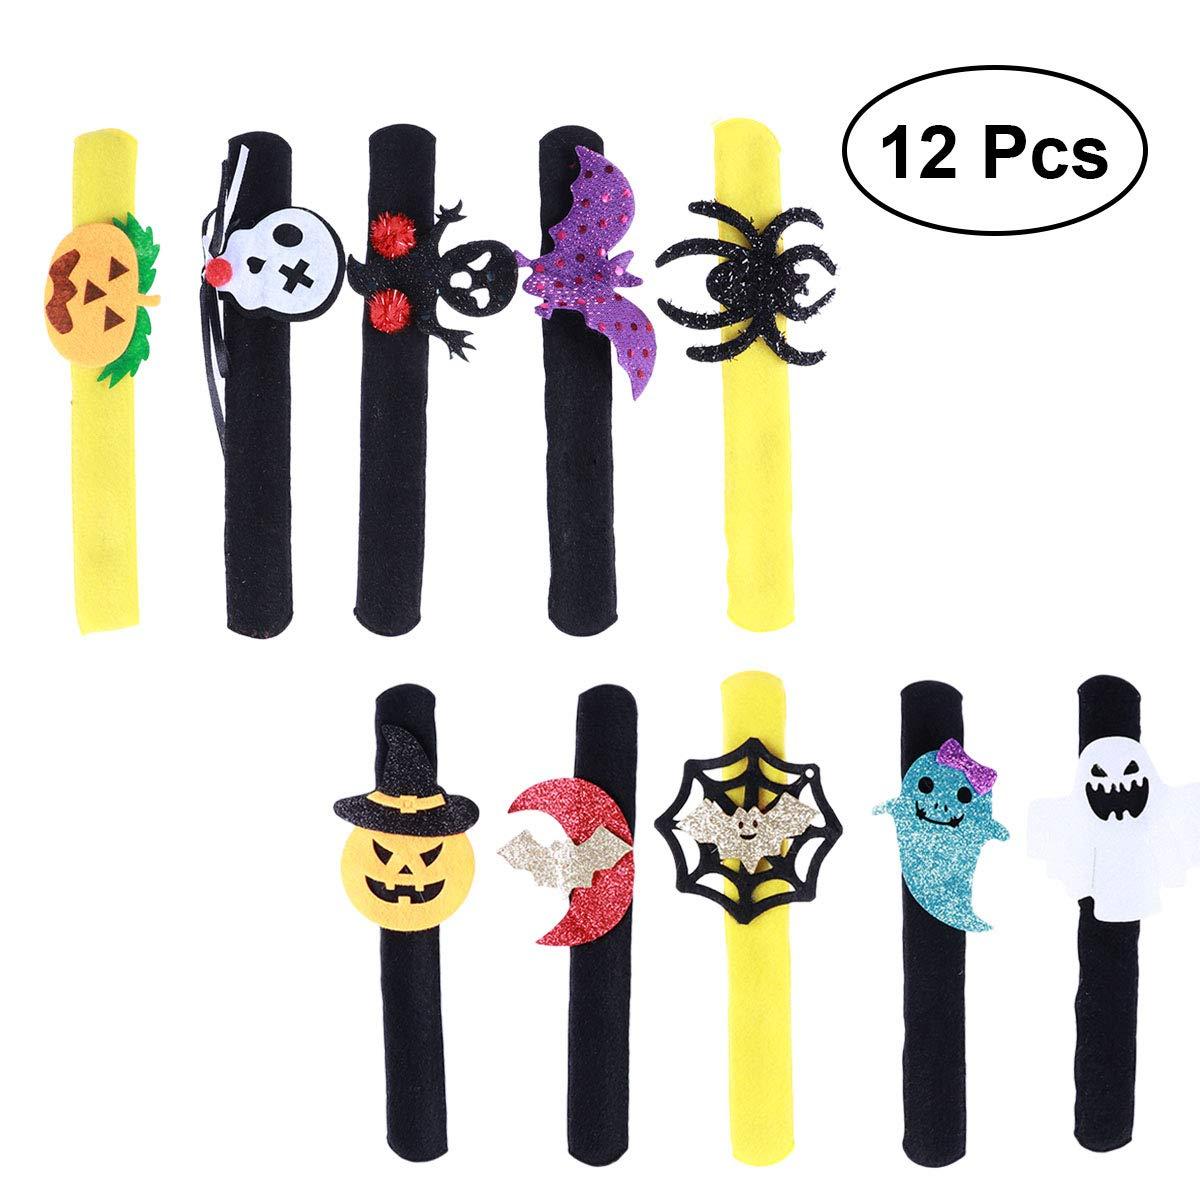 TOYMYTOY 12 Stück Kinder Armbänder für Halloween Partytüten Kürbis Spinne Silikon Armband